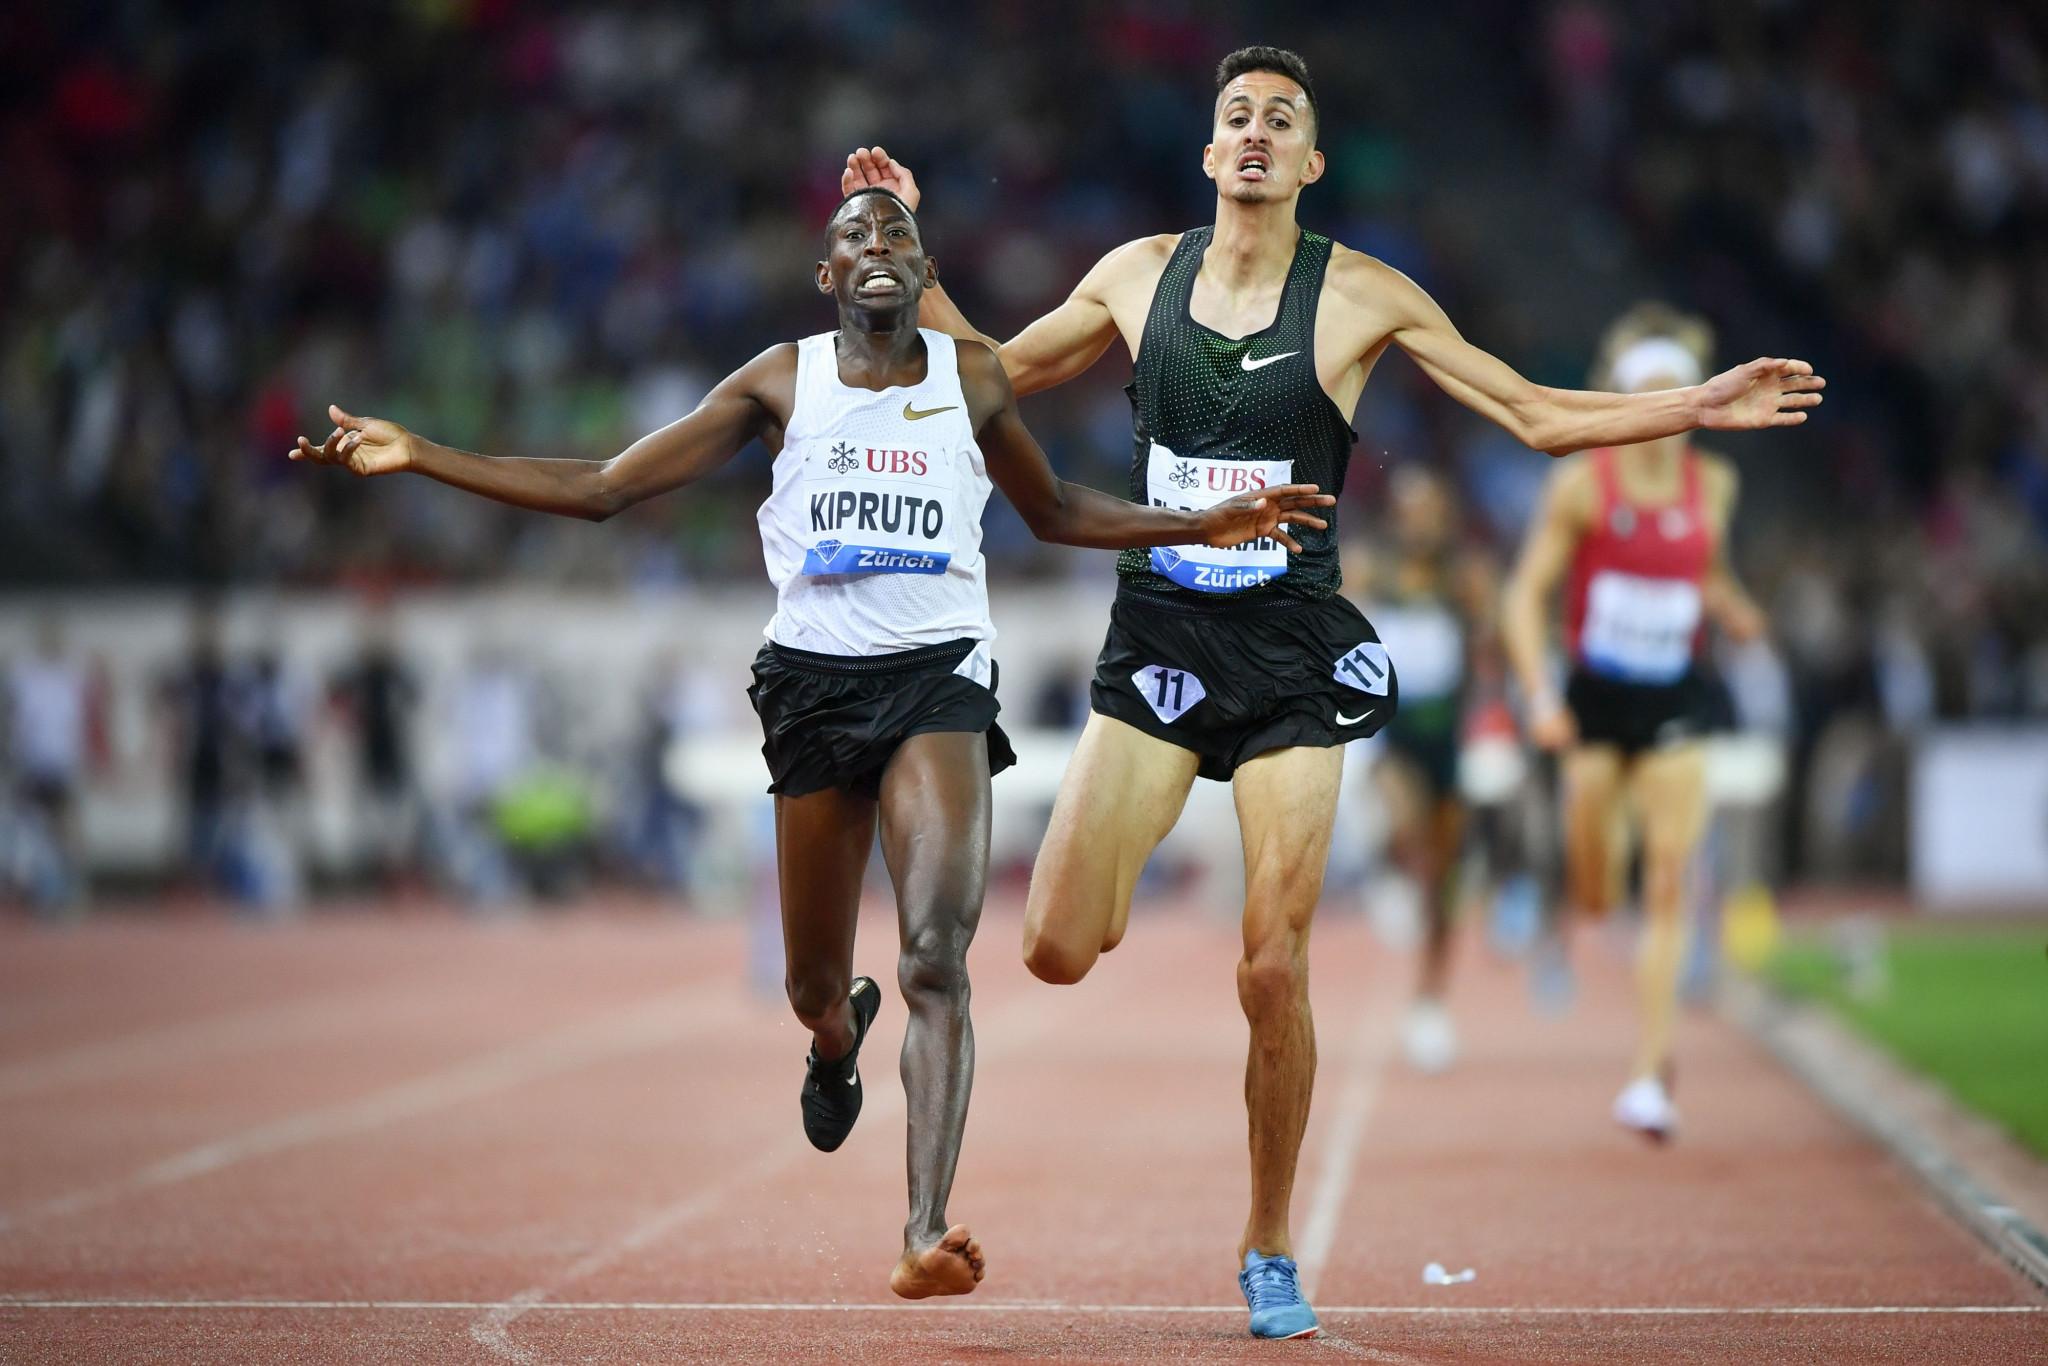 Kipruto retains 3,000m steeplechase Diamond League title in Zurich despite losing a shoe